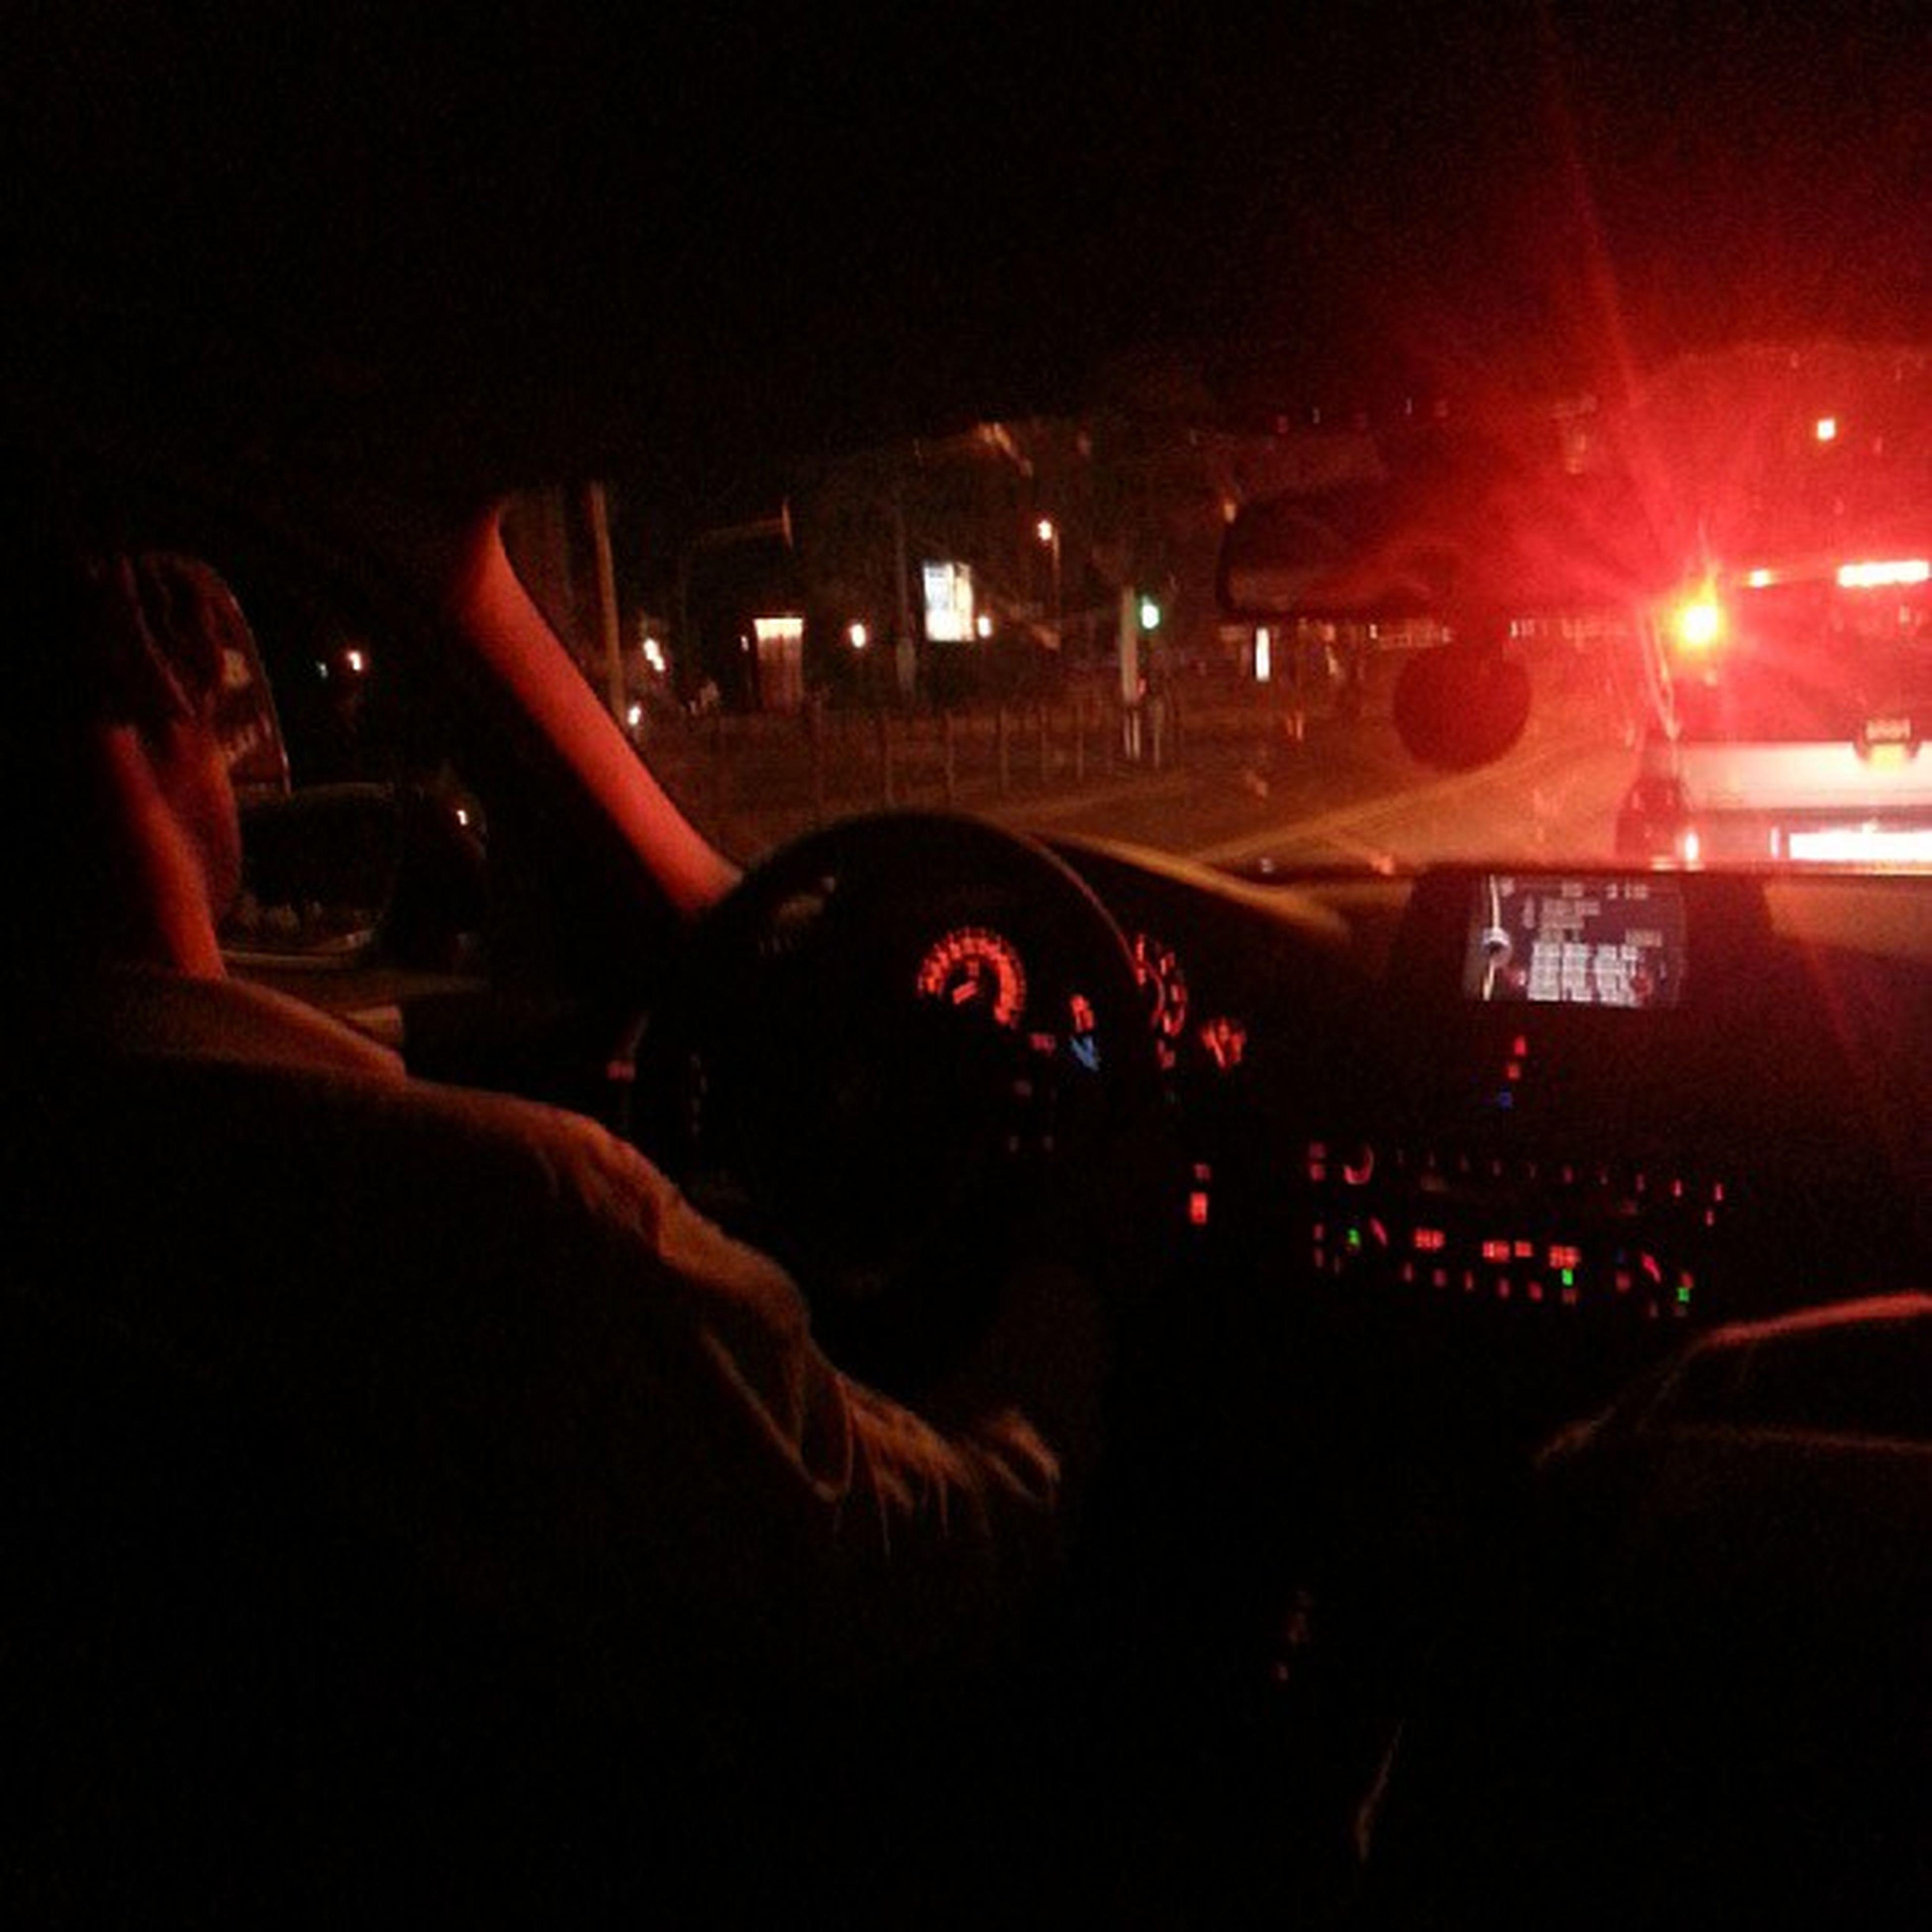 illuminated, night, transportation, mode of transport, land vehicle, car, lifestyles, vehicle interior, leisure activity, nightlife, men, blurred motion, travel, music, car interior, indoors, technology, arts culture and entertainment